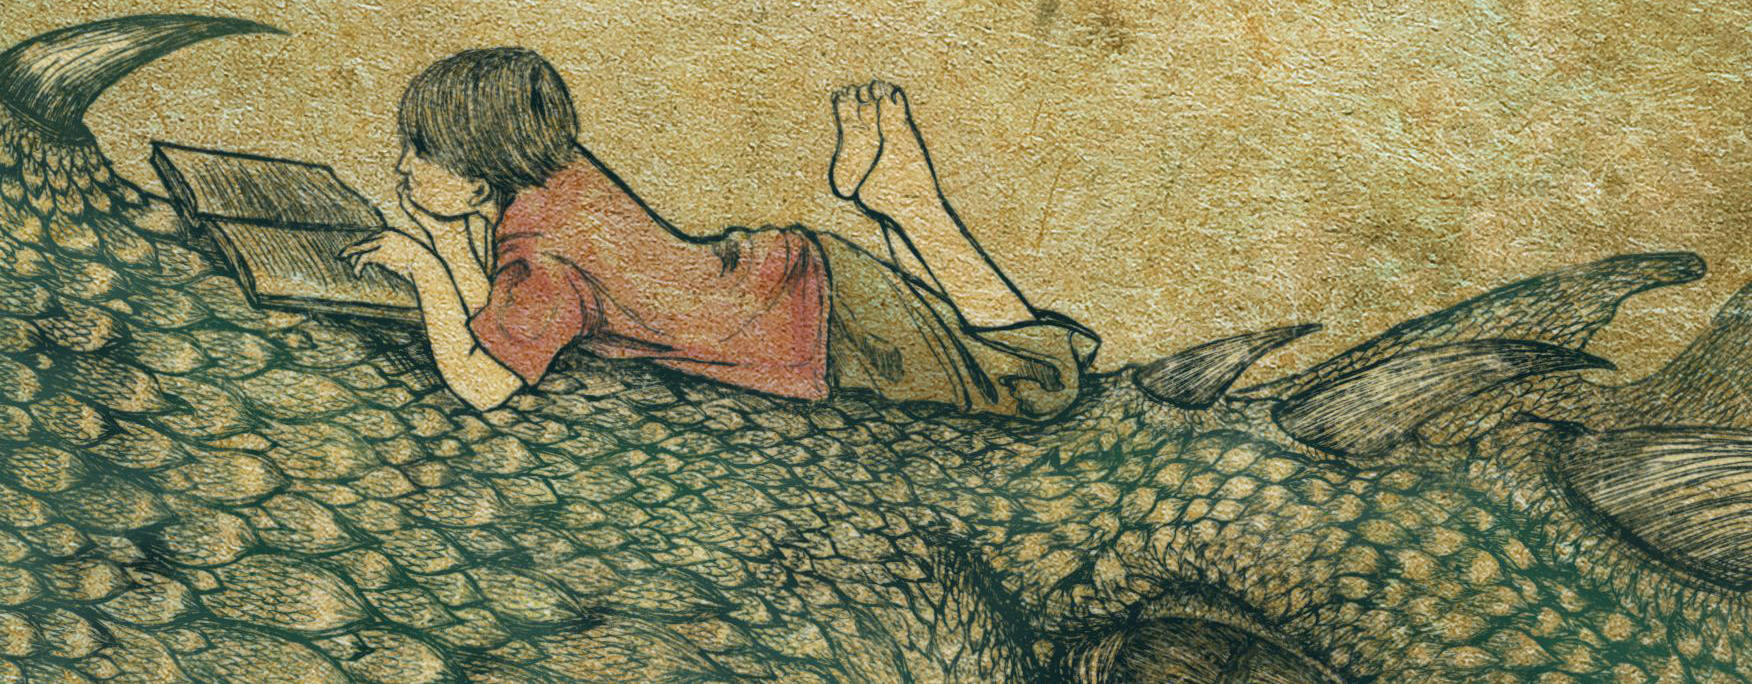 IllustrationFeaturedImage.jpg